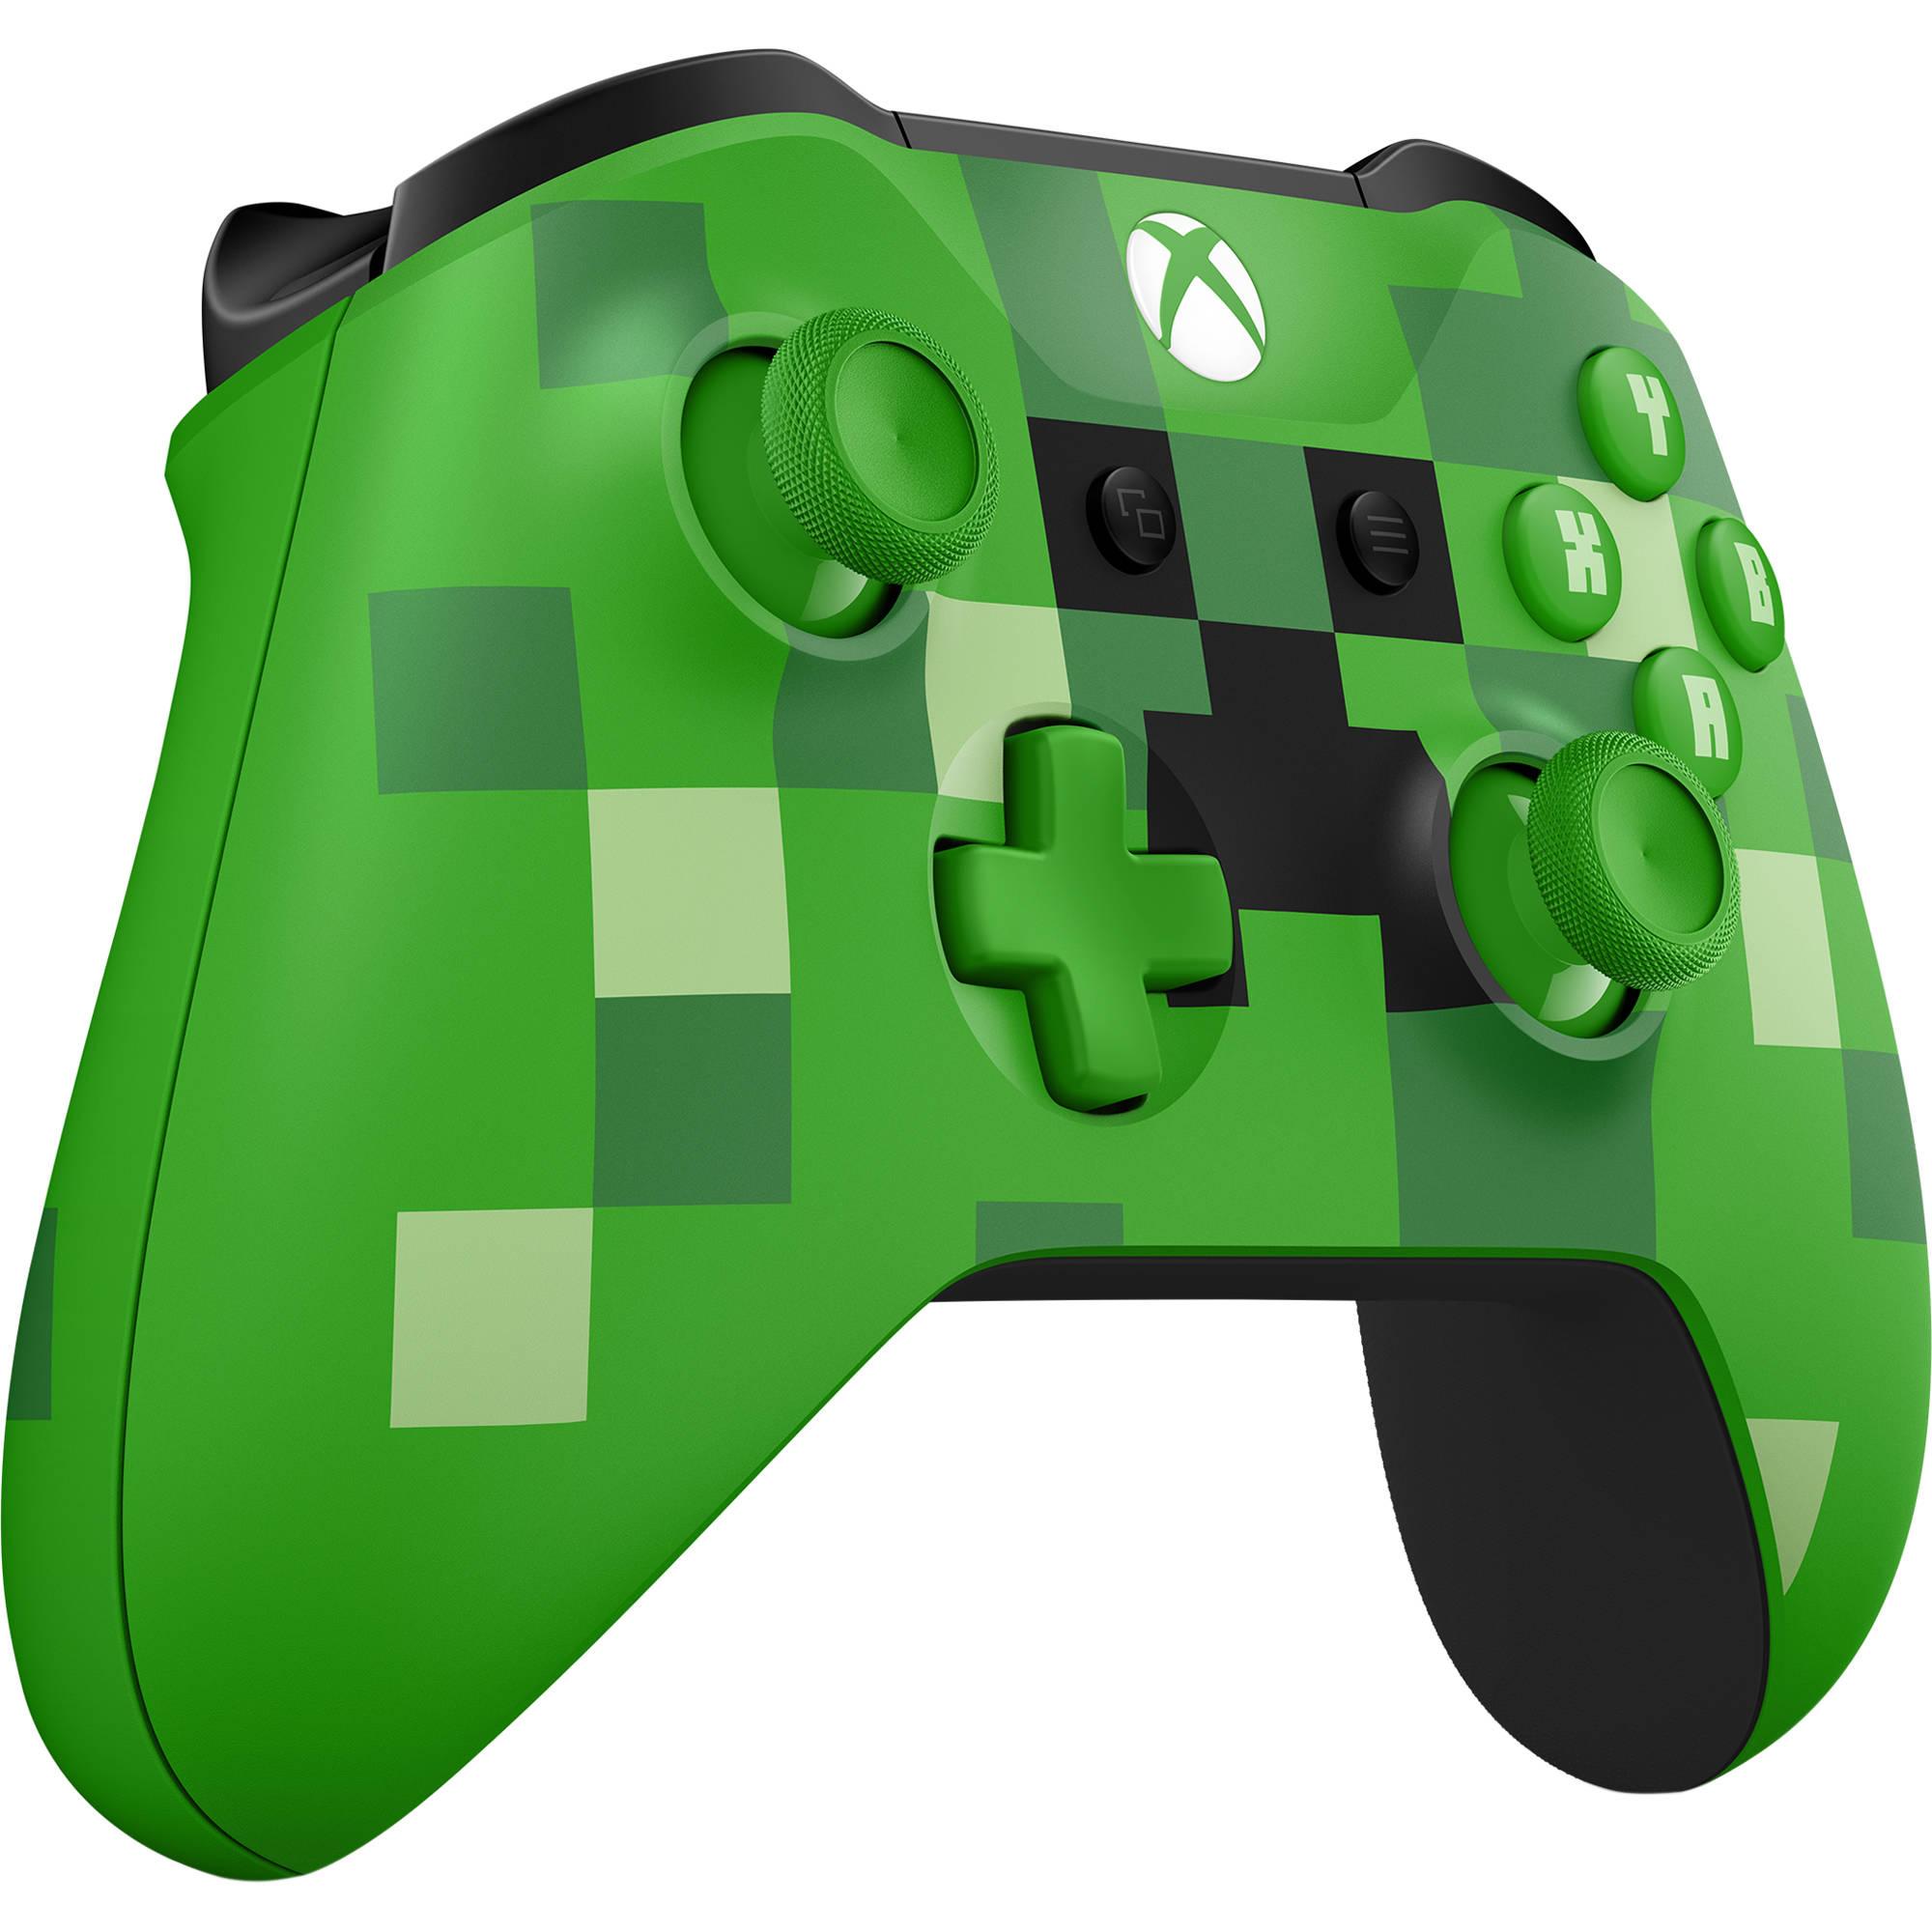 Microsoft Xbox One Wireless Controller WL3-00056 B H Photo Video 39ddd28191795